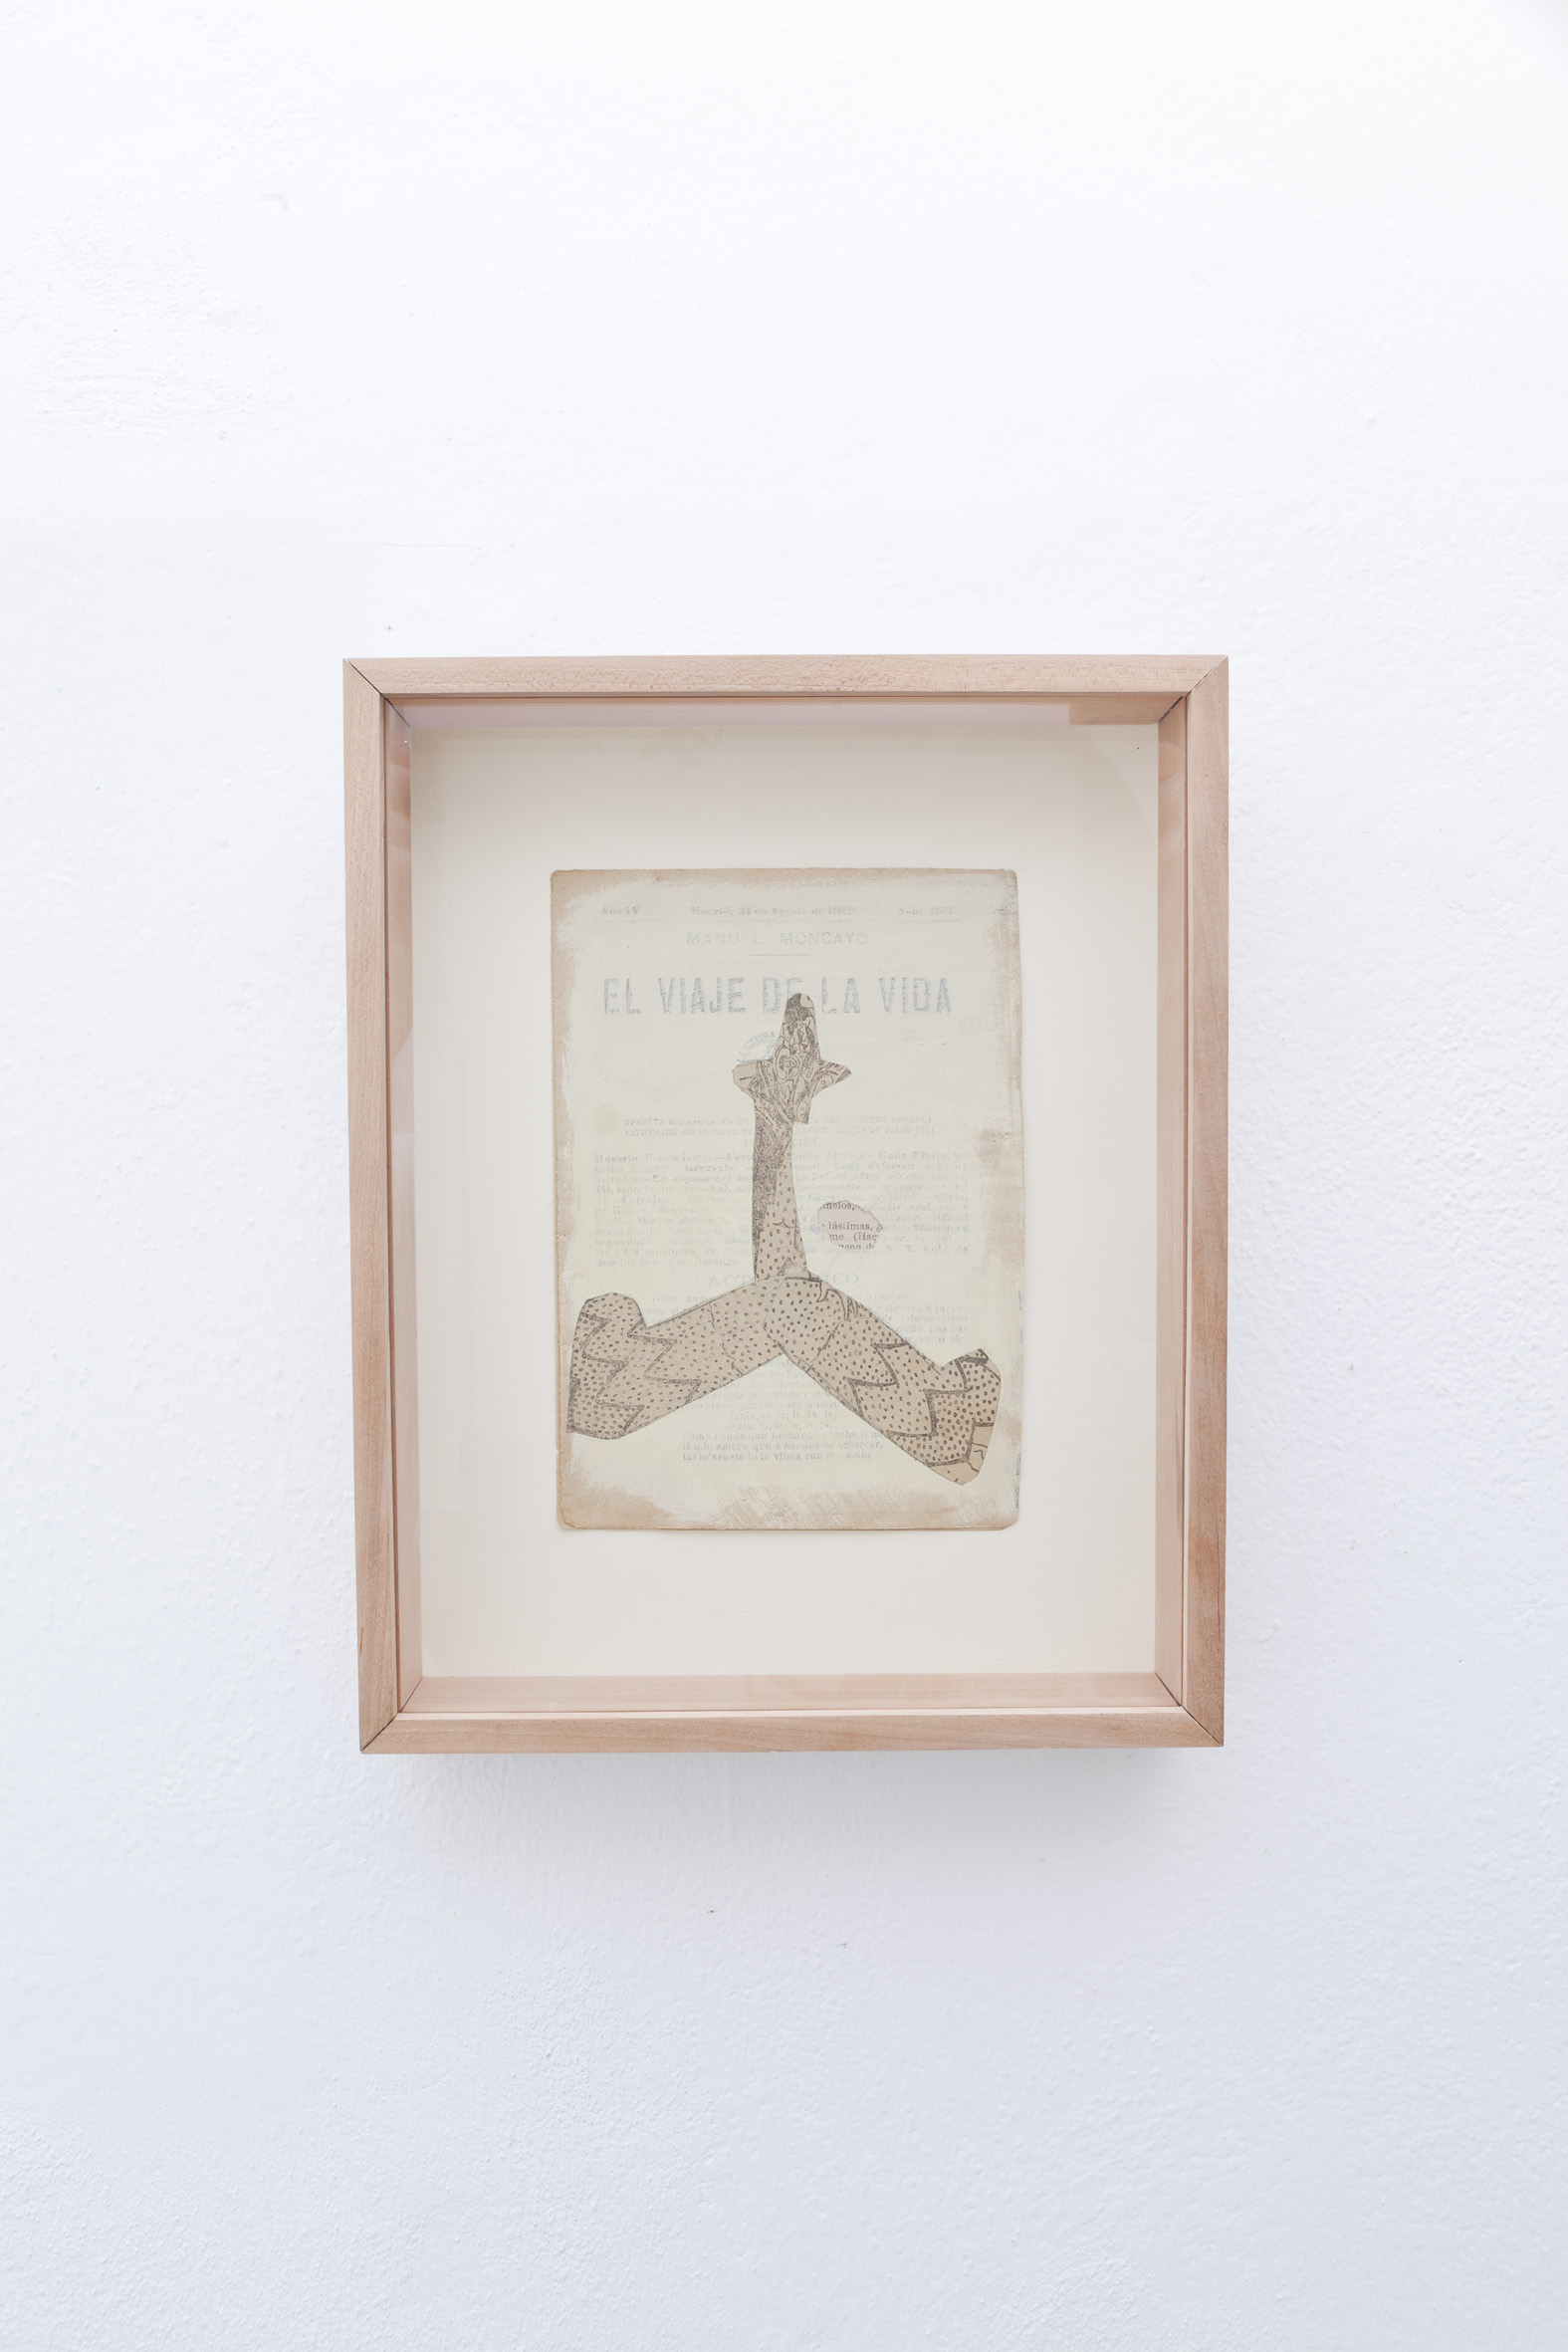 S. Vendramel,  El viaje,  2018 - Collage e pittura su carta - cm 18x13